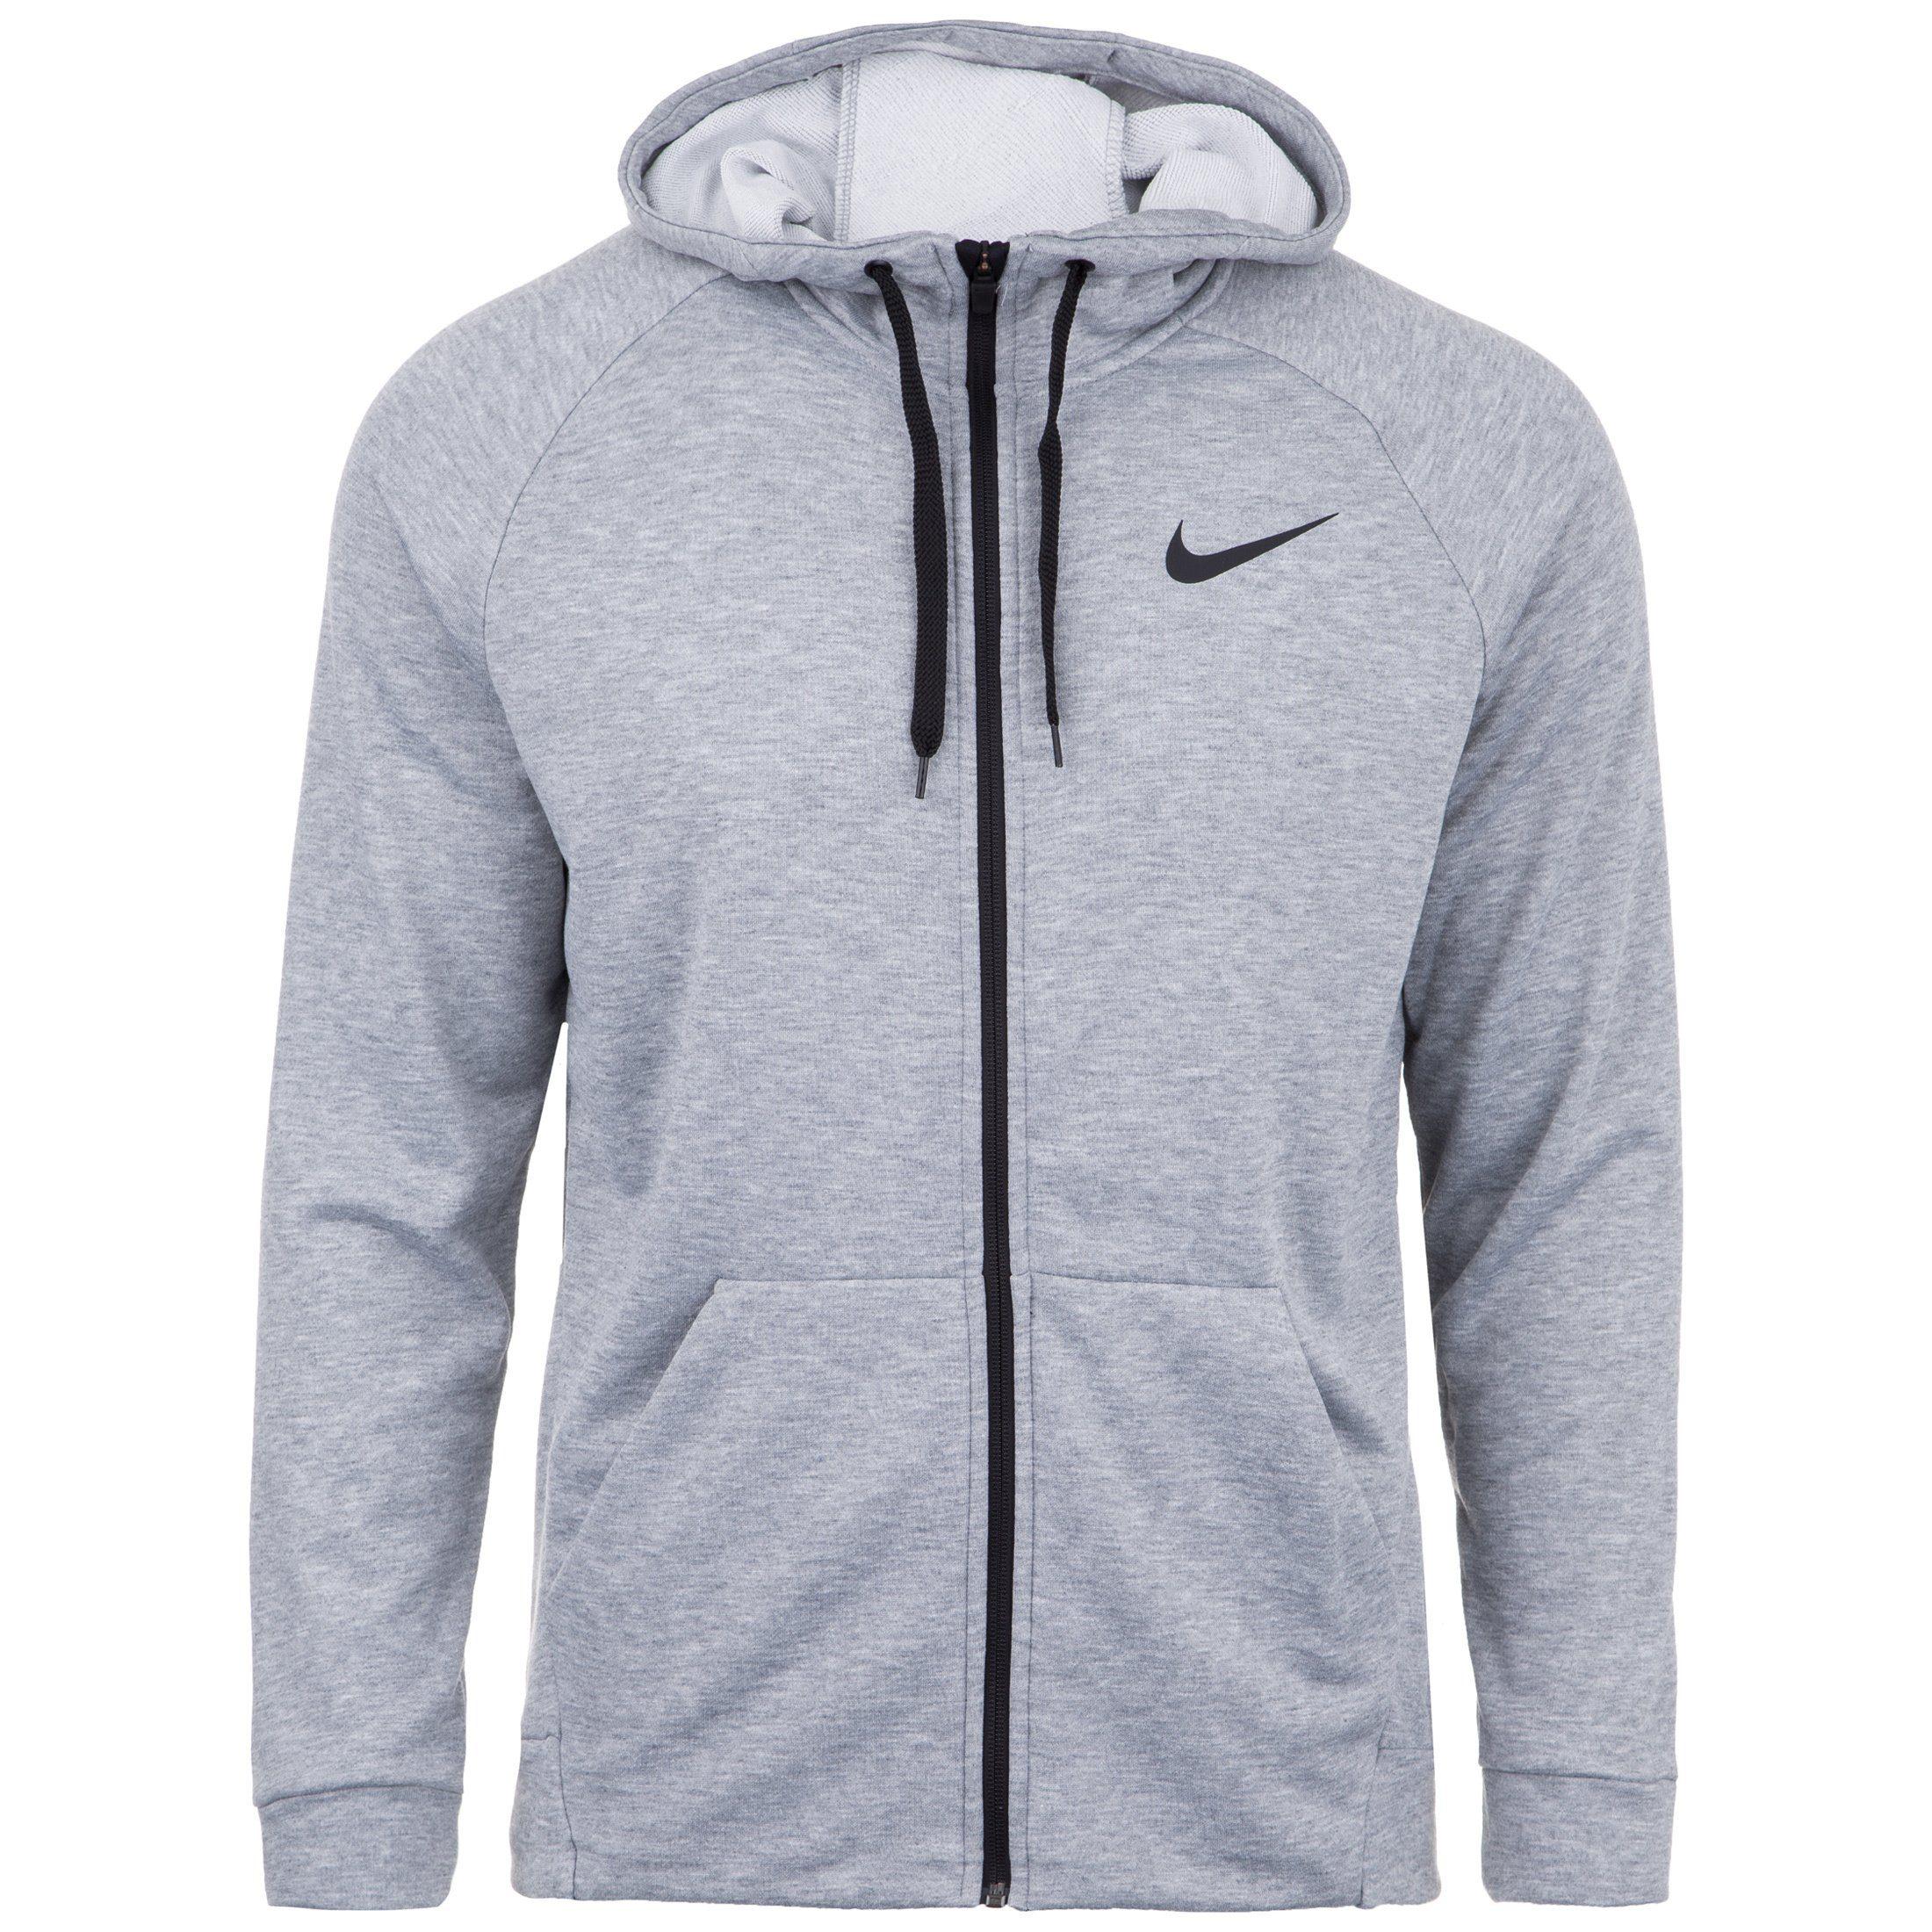 Nike Trainingsjacke Dry Fleece Gfx | Sportbekleidung > Sportjacken > Trainingsjacken | Grau | Nike